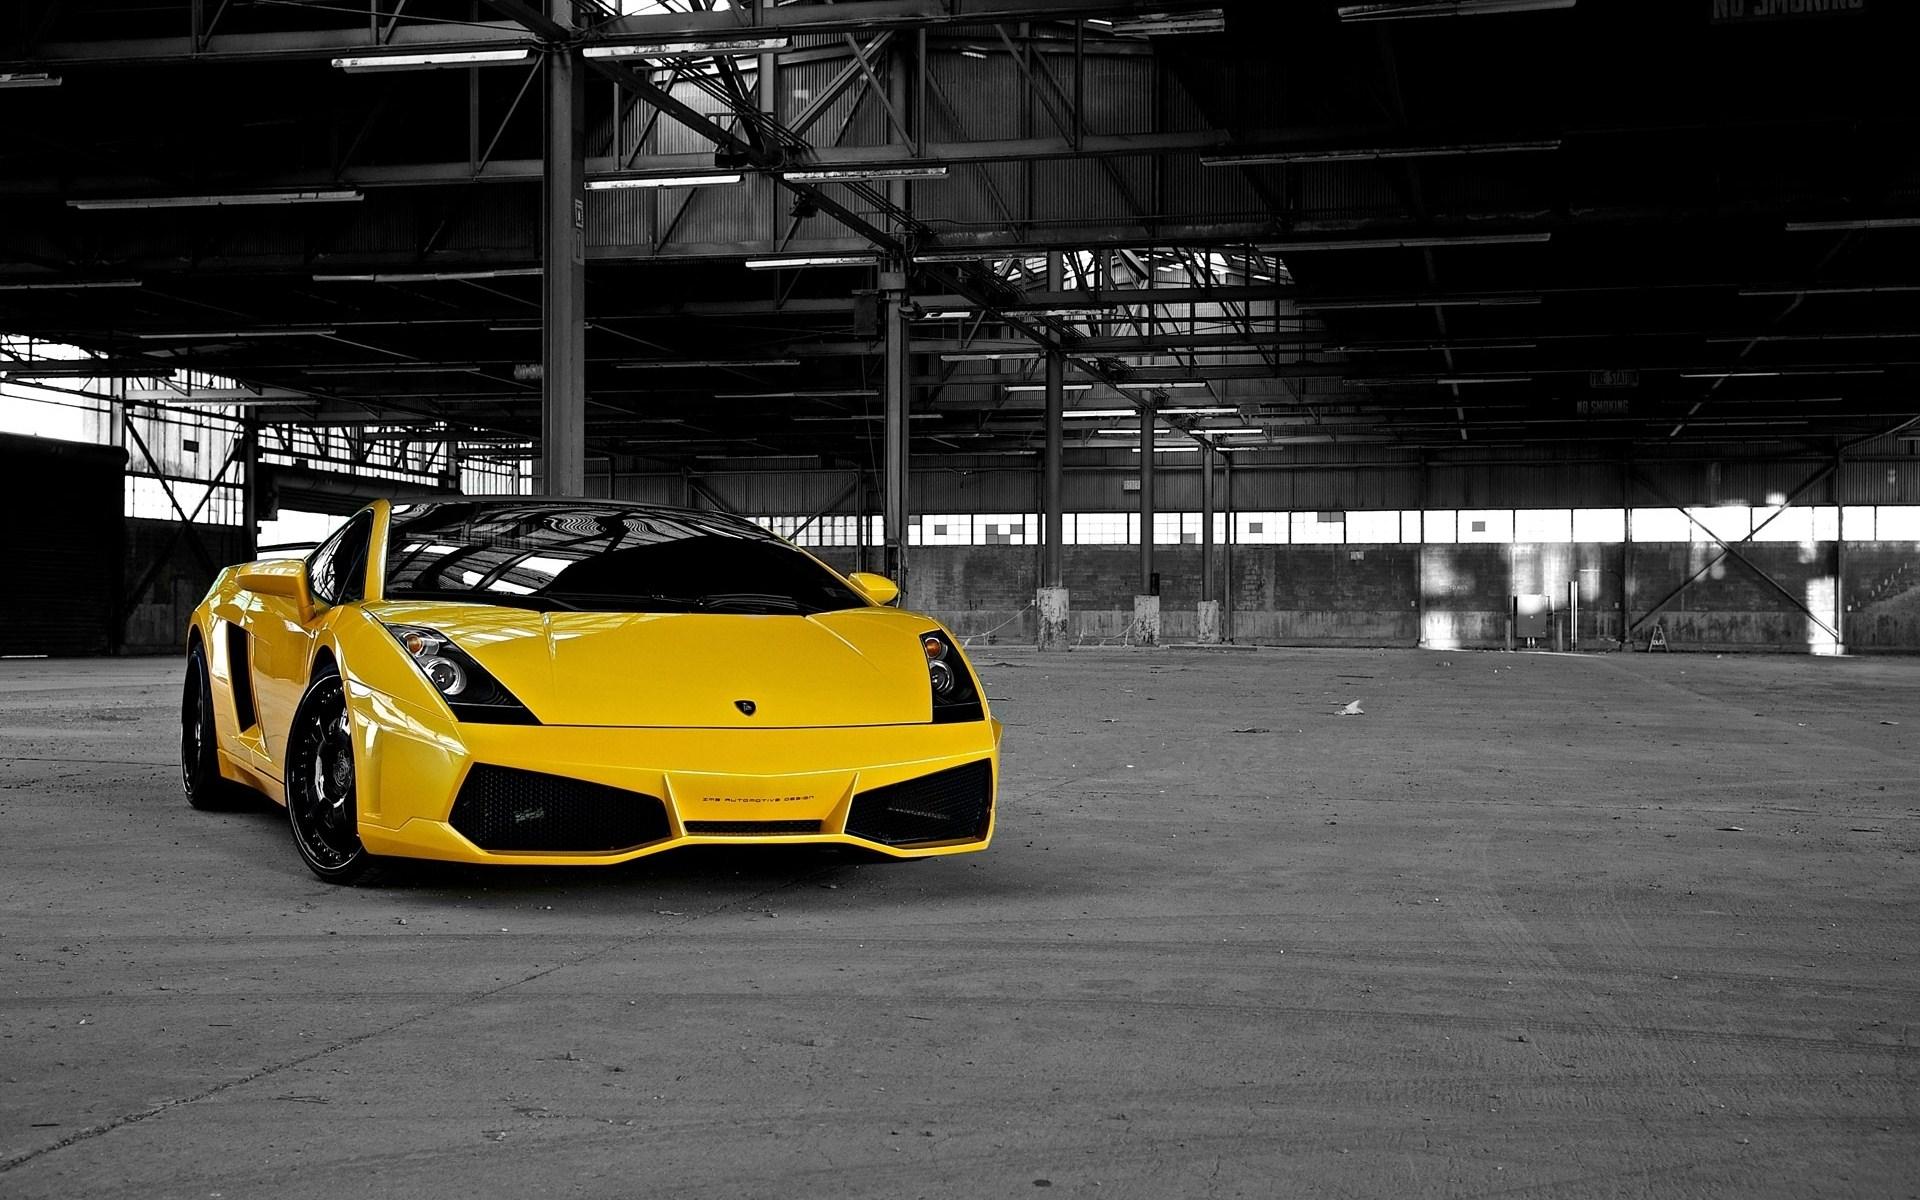 Yellow Lamborghini Wallpaper 6795207 1920x1200